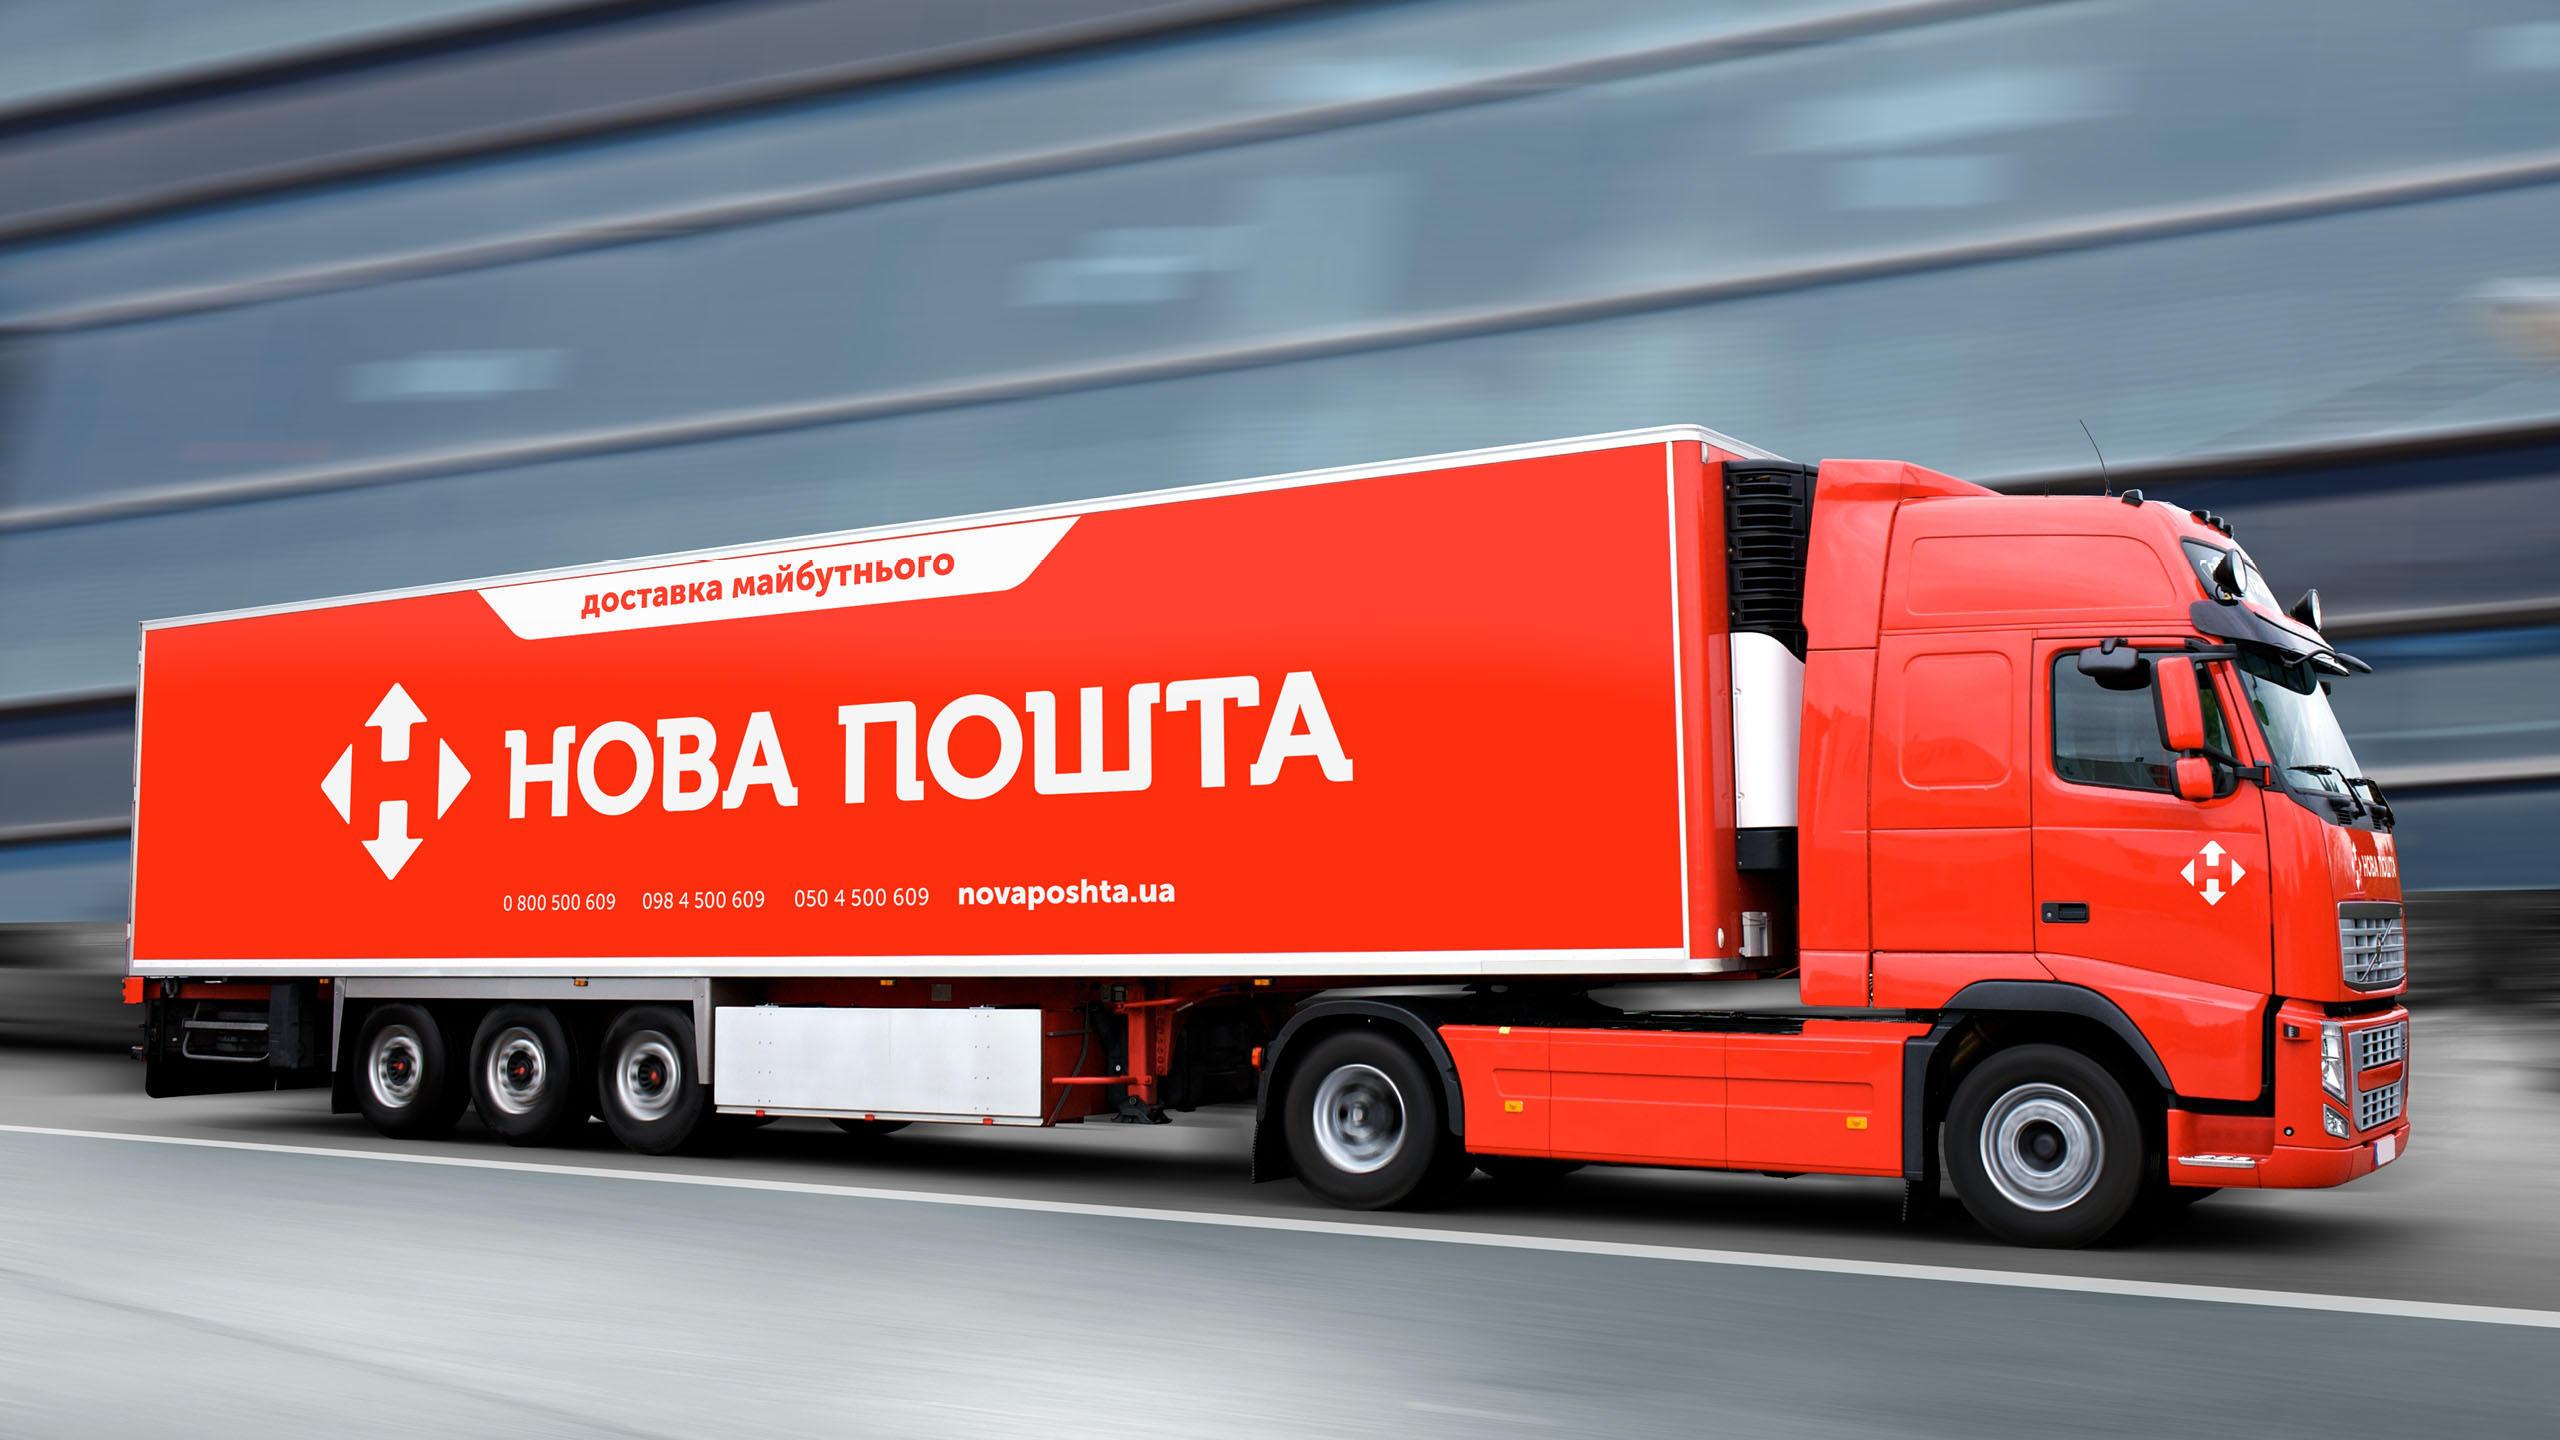 «Нова пошта» запустила нову платіжну систему